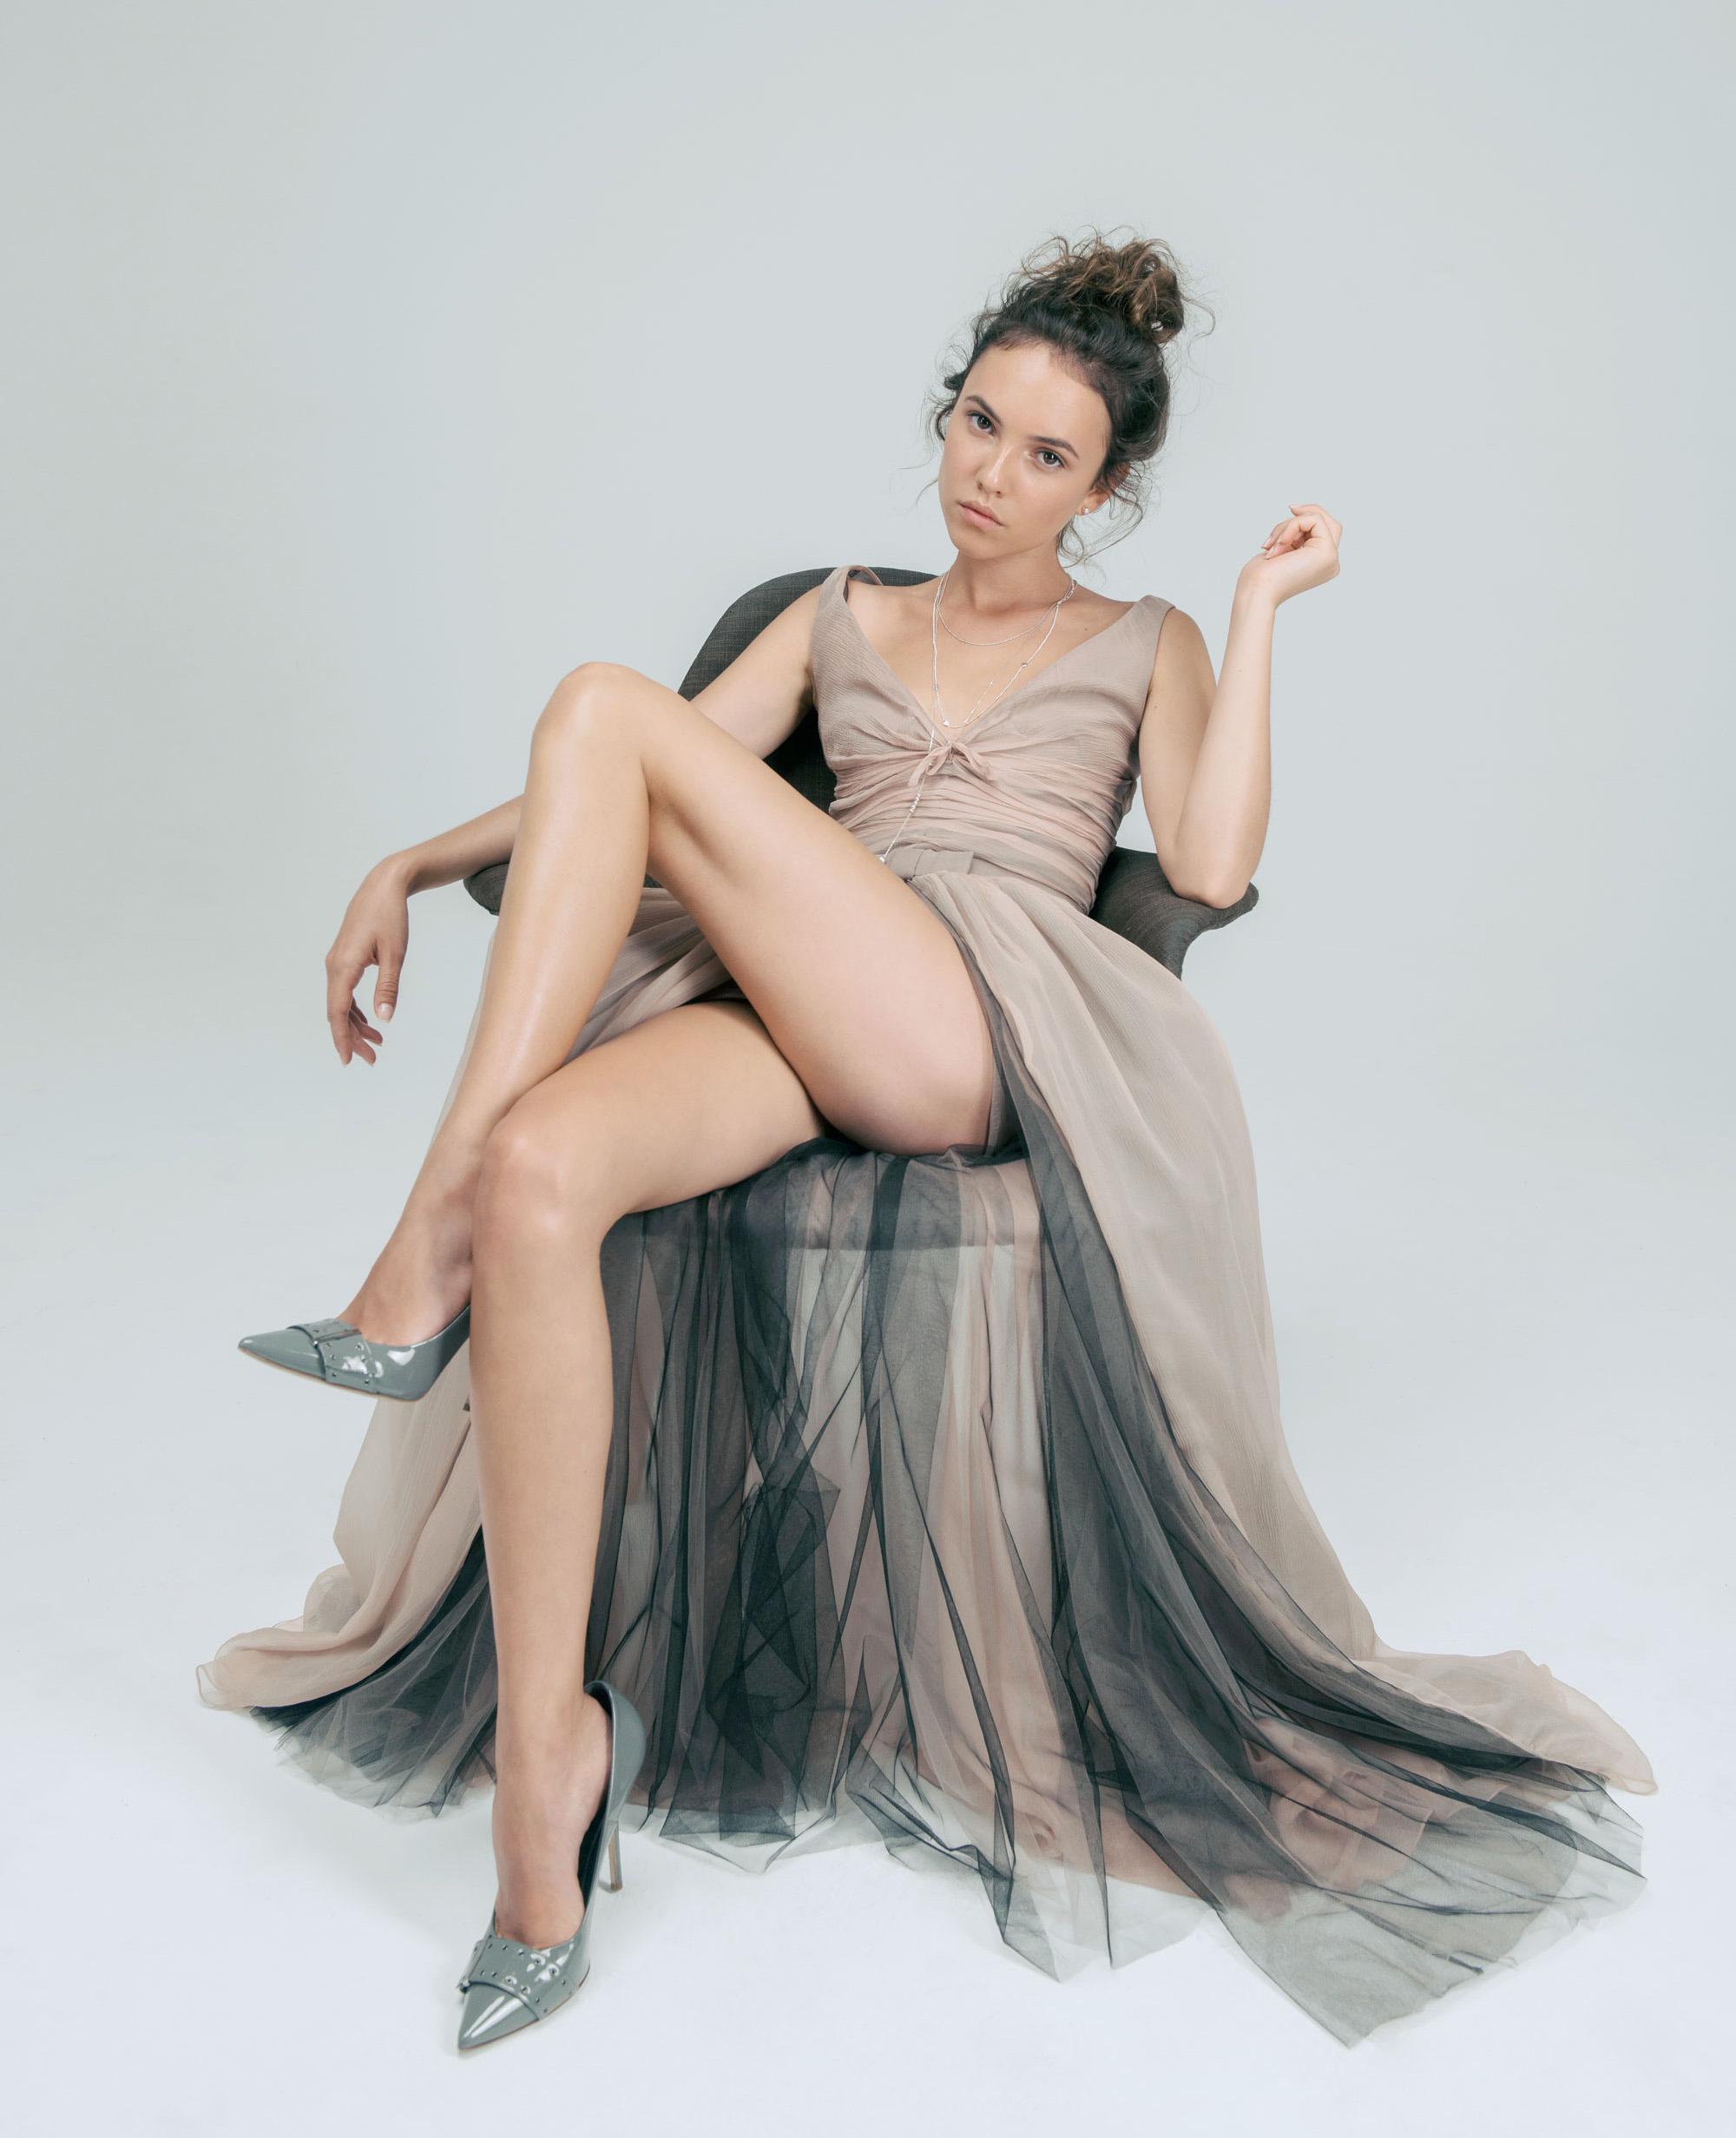 Комбинезон июбка, Dior;  серьги, цепочка иподвески,все Pandora